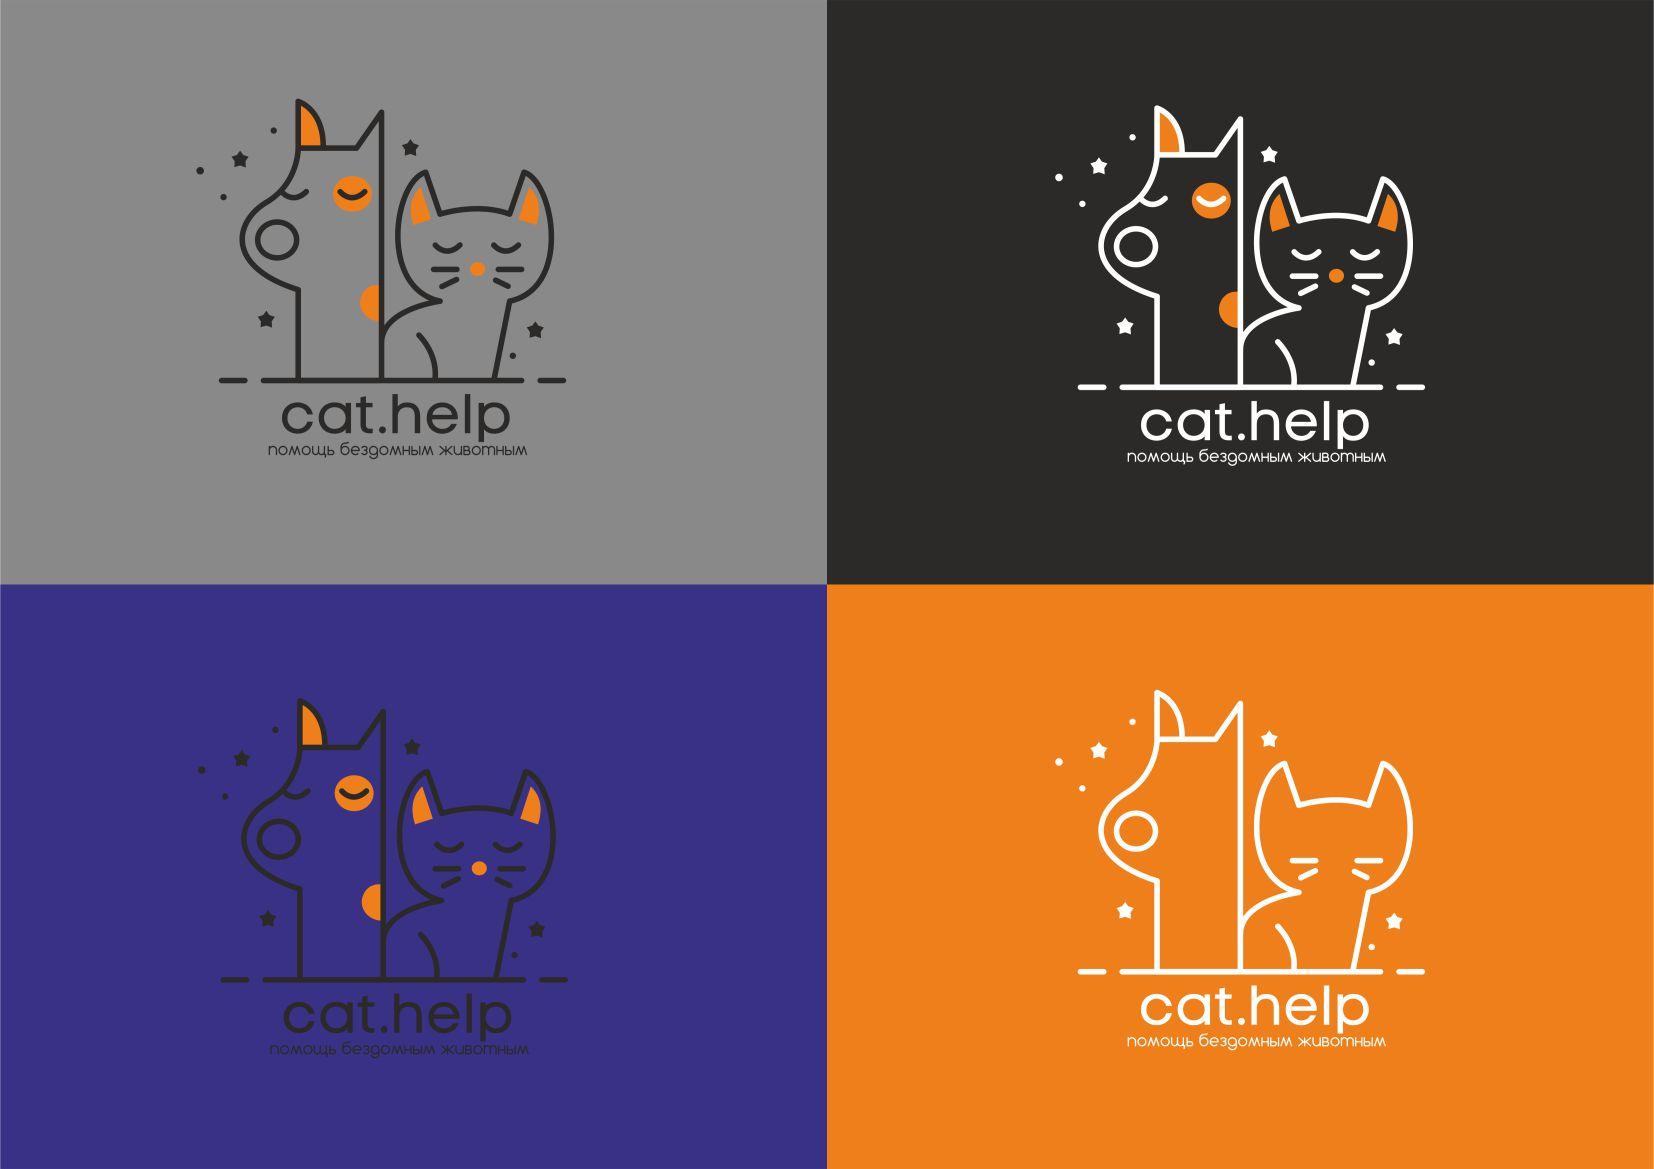 логотип для сайта и группы вк - cat.help фото f_70459e2bbf873ed5.jpg